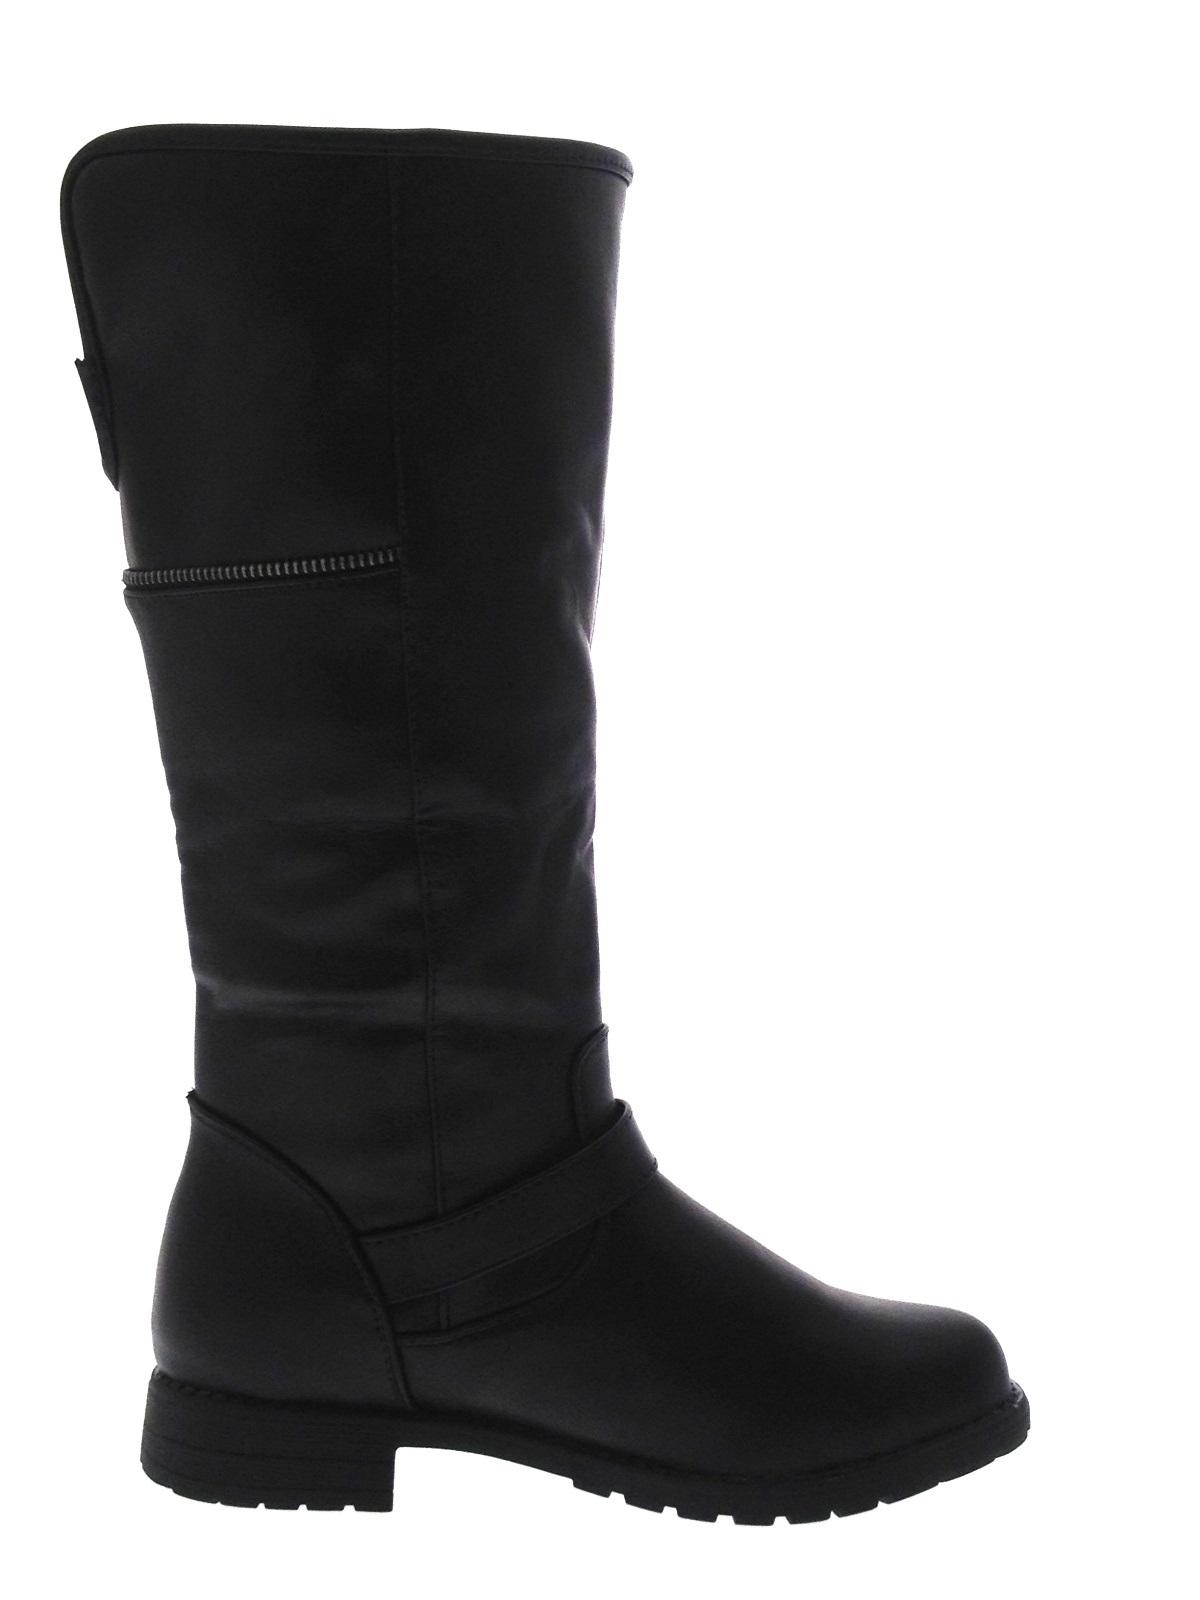 Simple Ladies Black Or Dark Grey Biker Boots Womens Boots Size Uk 3 4 5 6 7 8 | EBay